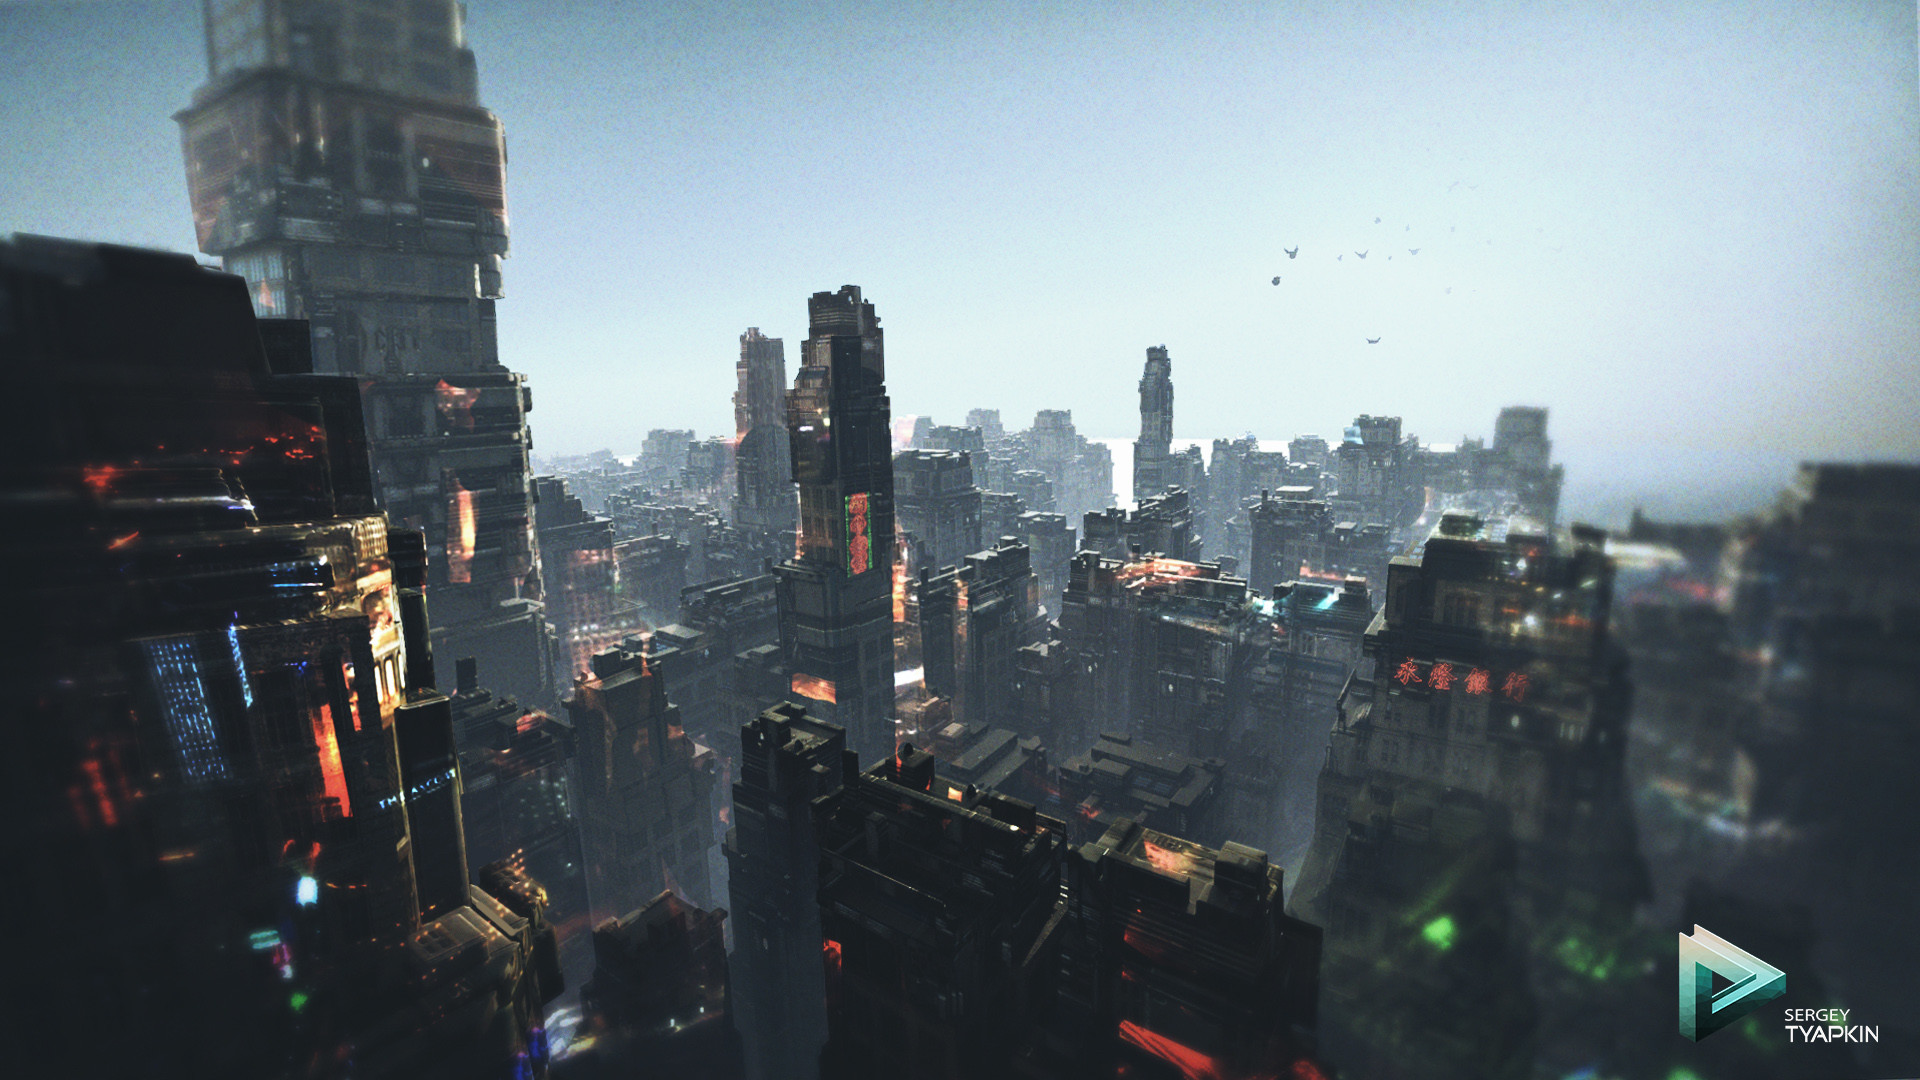 Sergey tyapkin scifi city concept scene 03